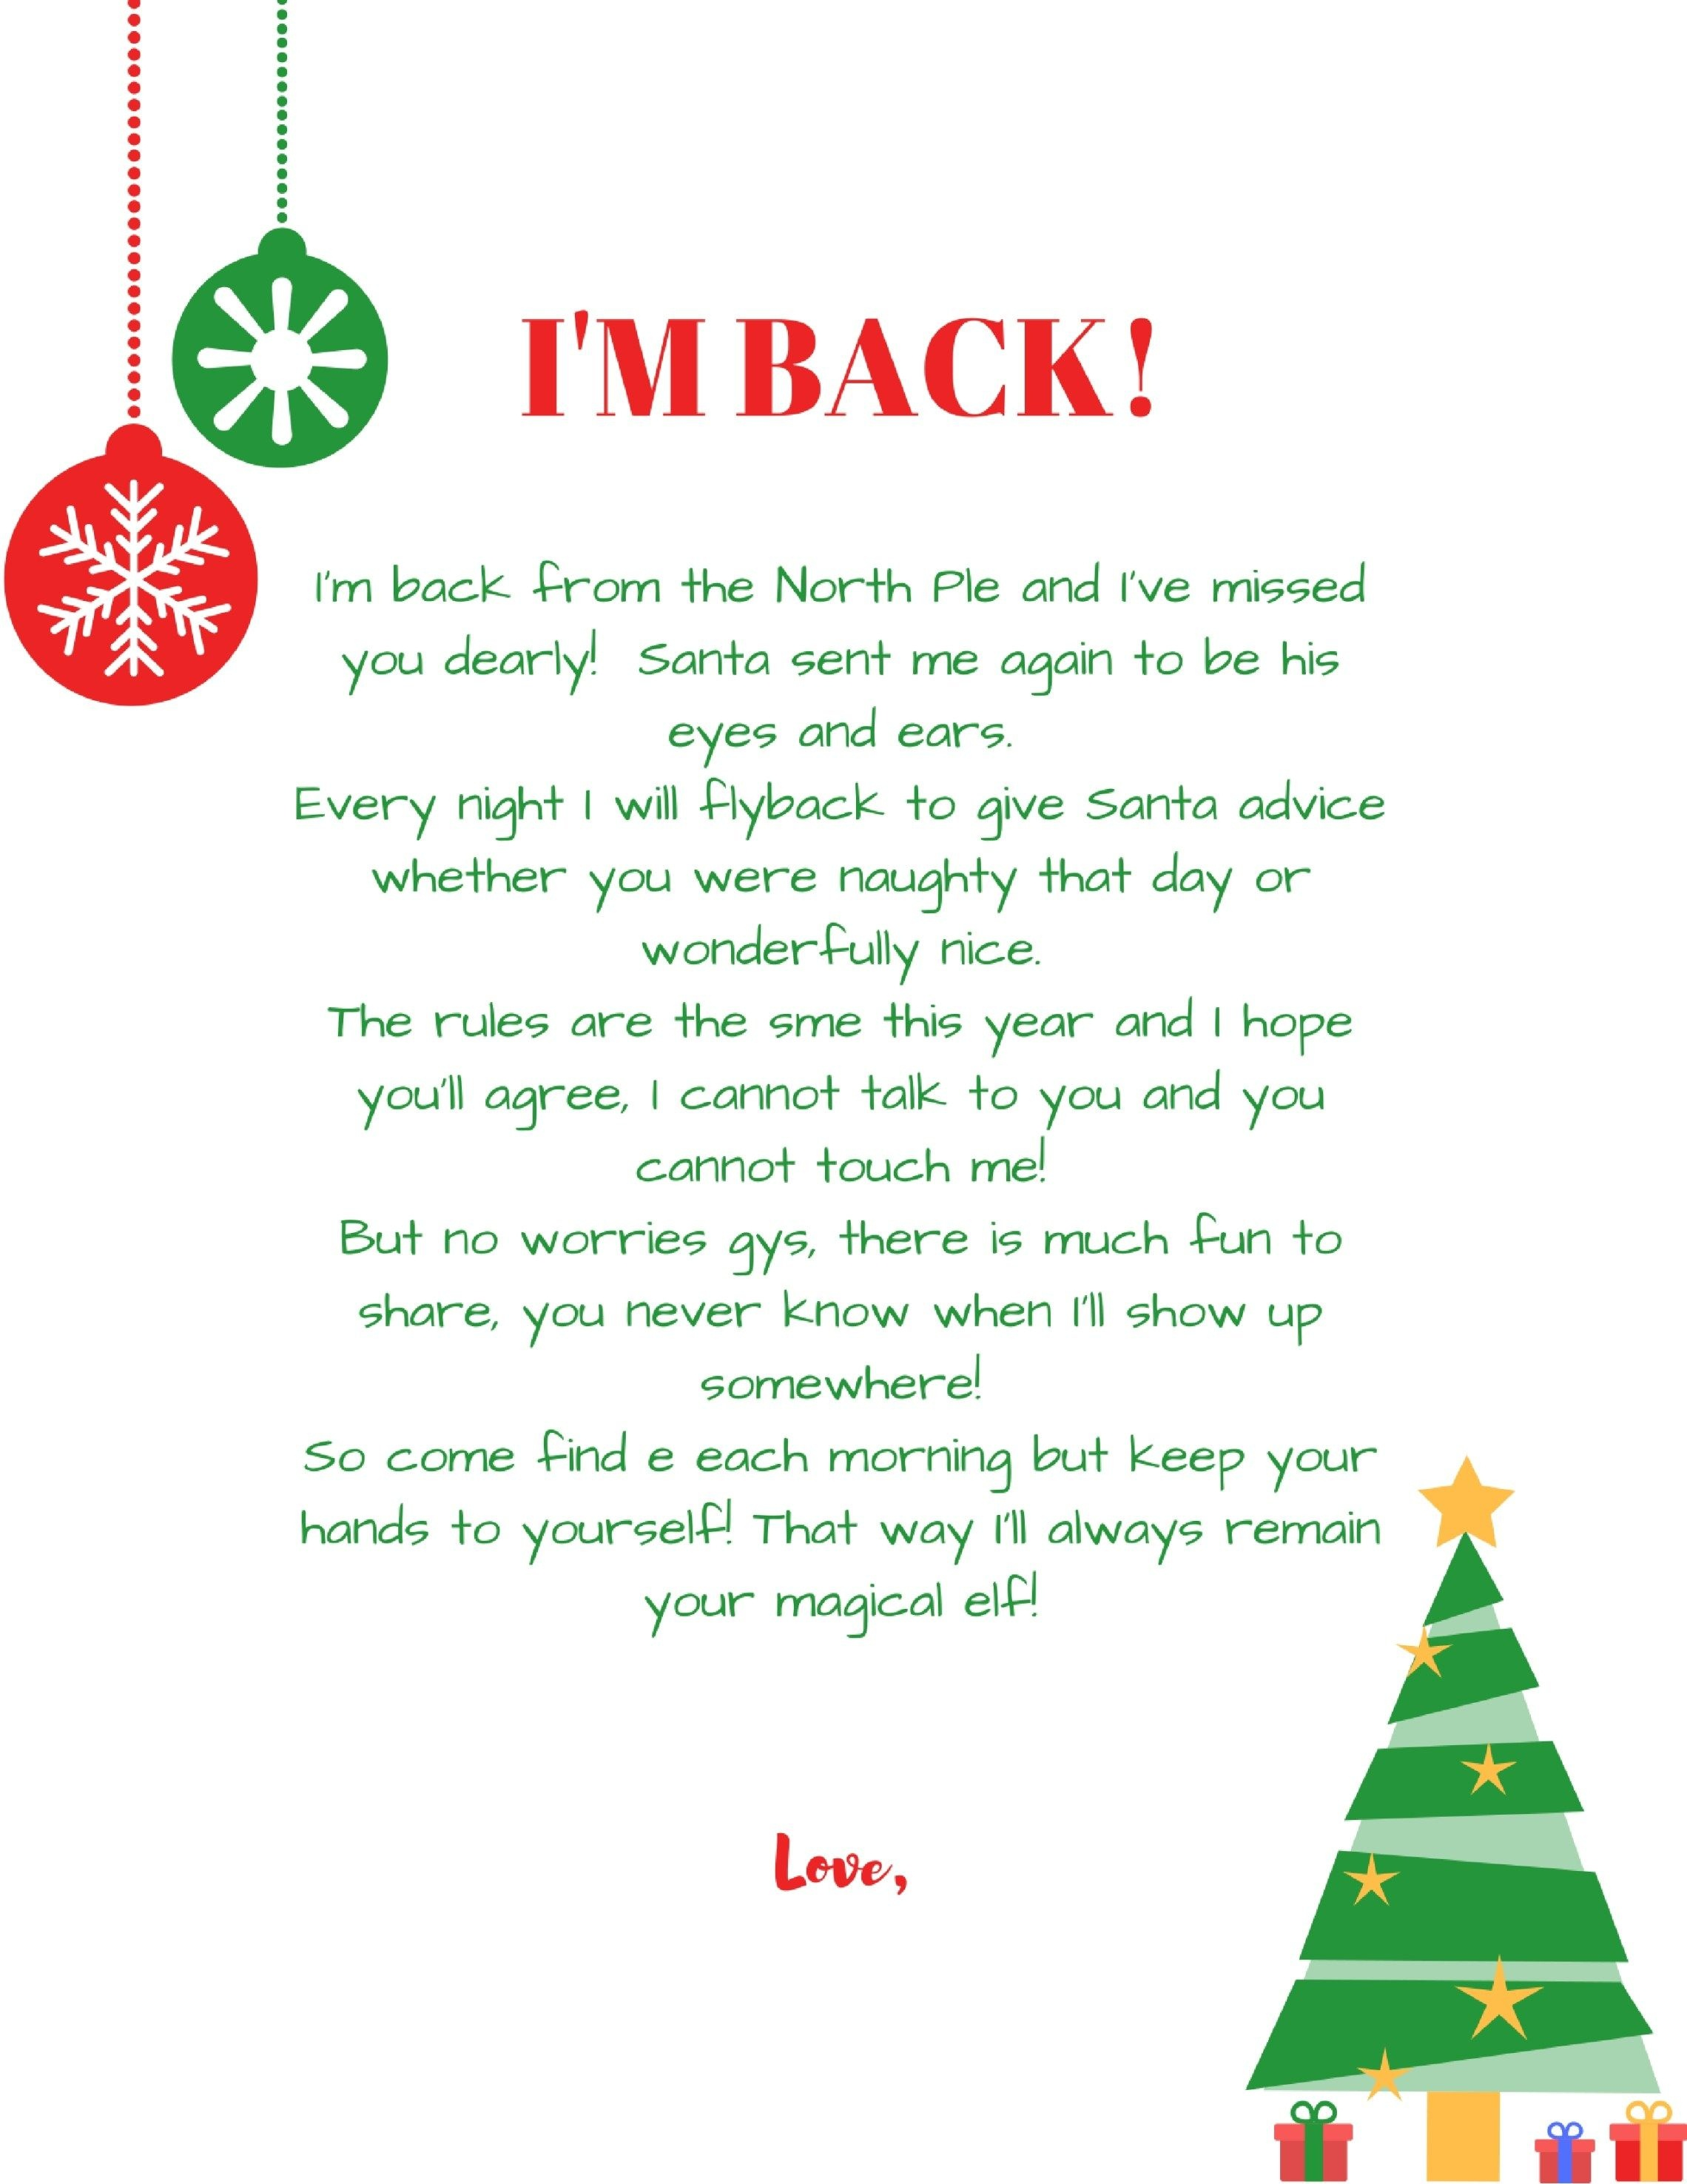 Im-Back-Elf-On-The-Shelf-Arrival-Letter-Free-Printable | Holiday - Free Printable Elf On Shelf Arrival Letter